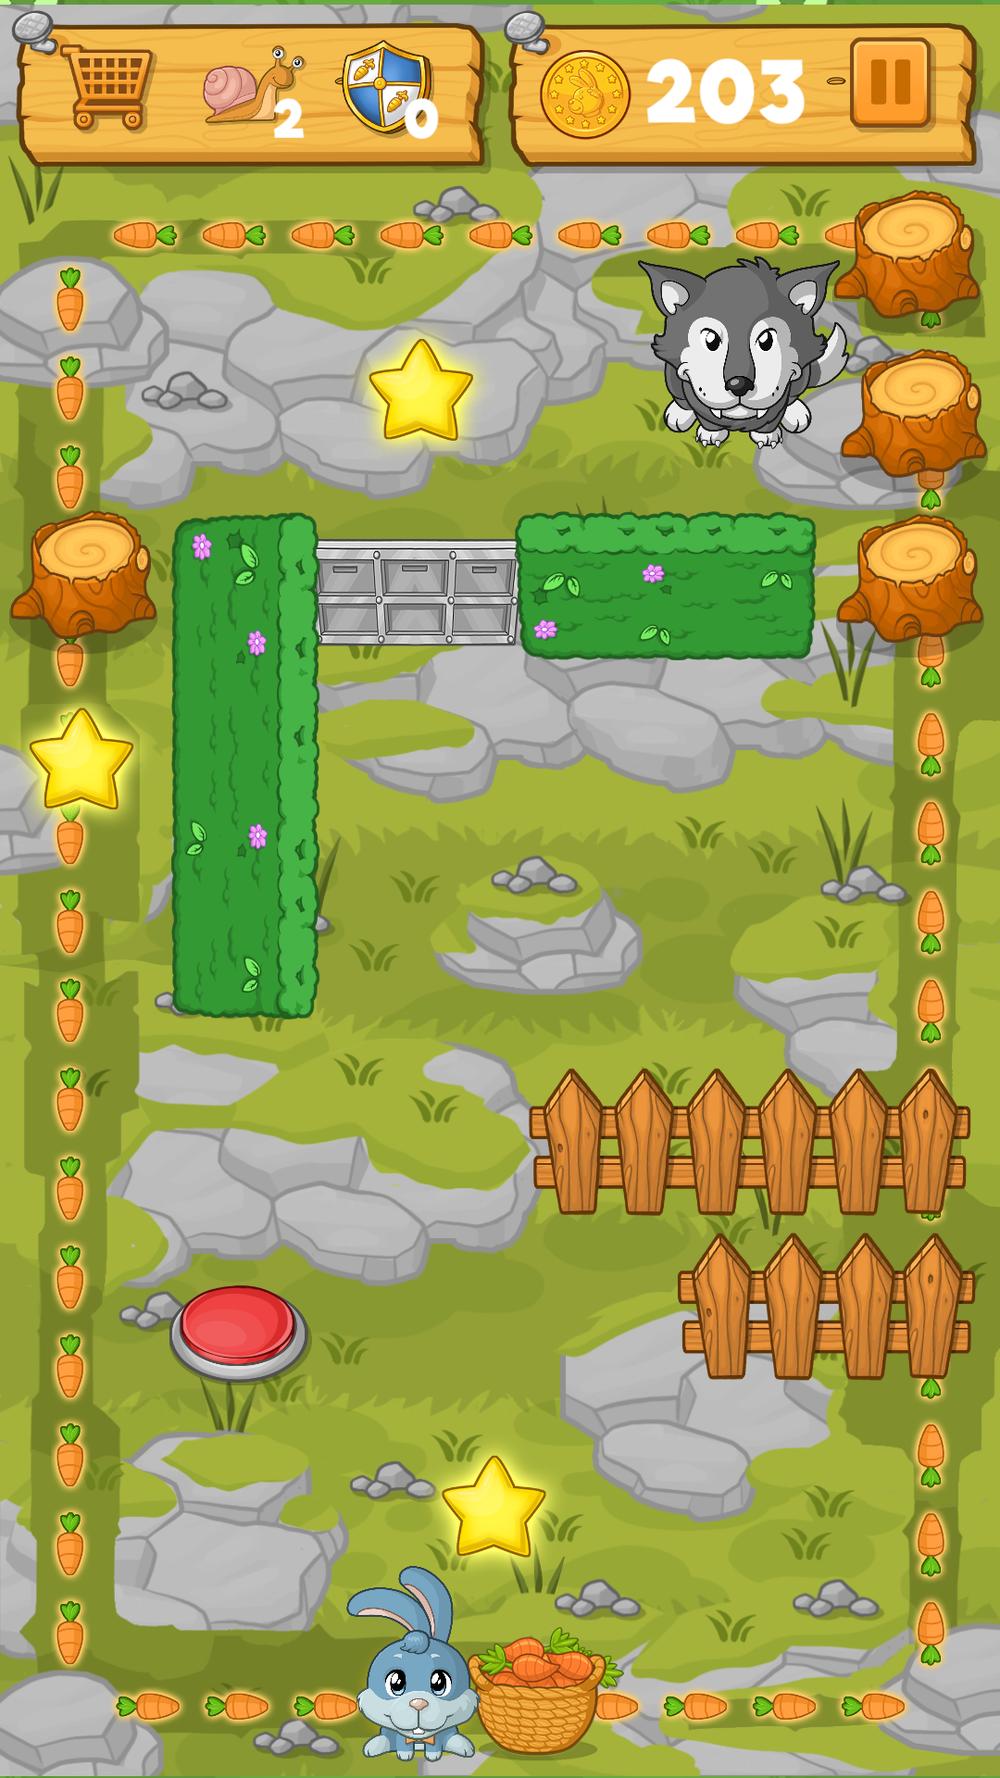 bunnyblocker2.png